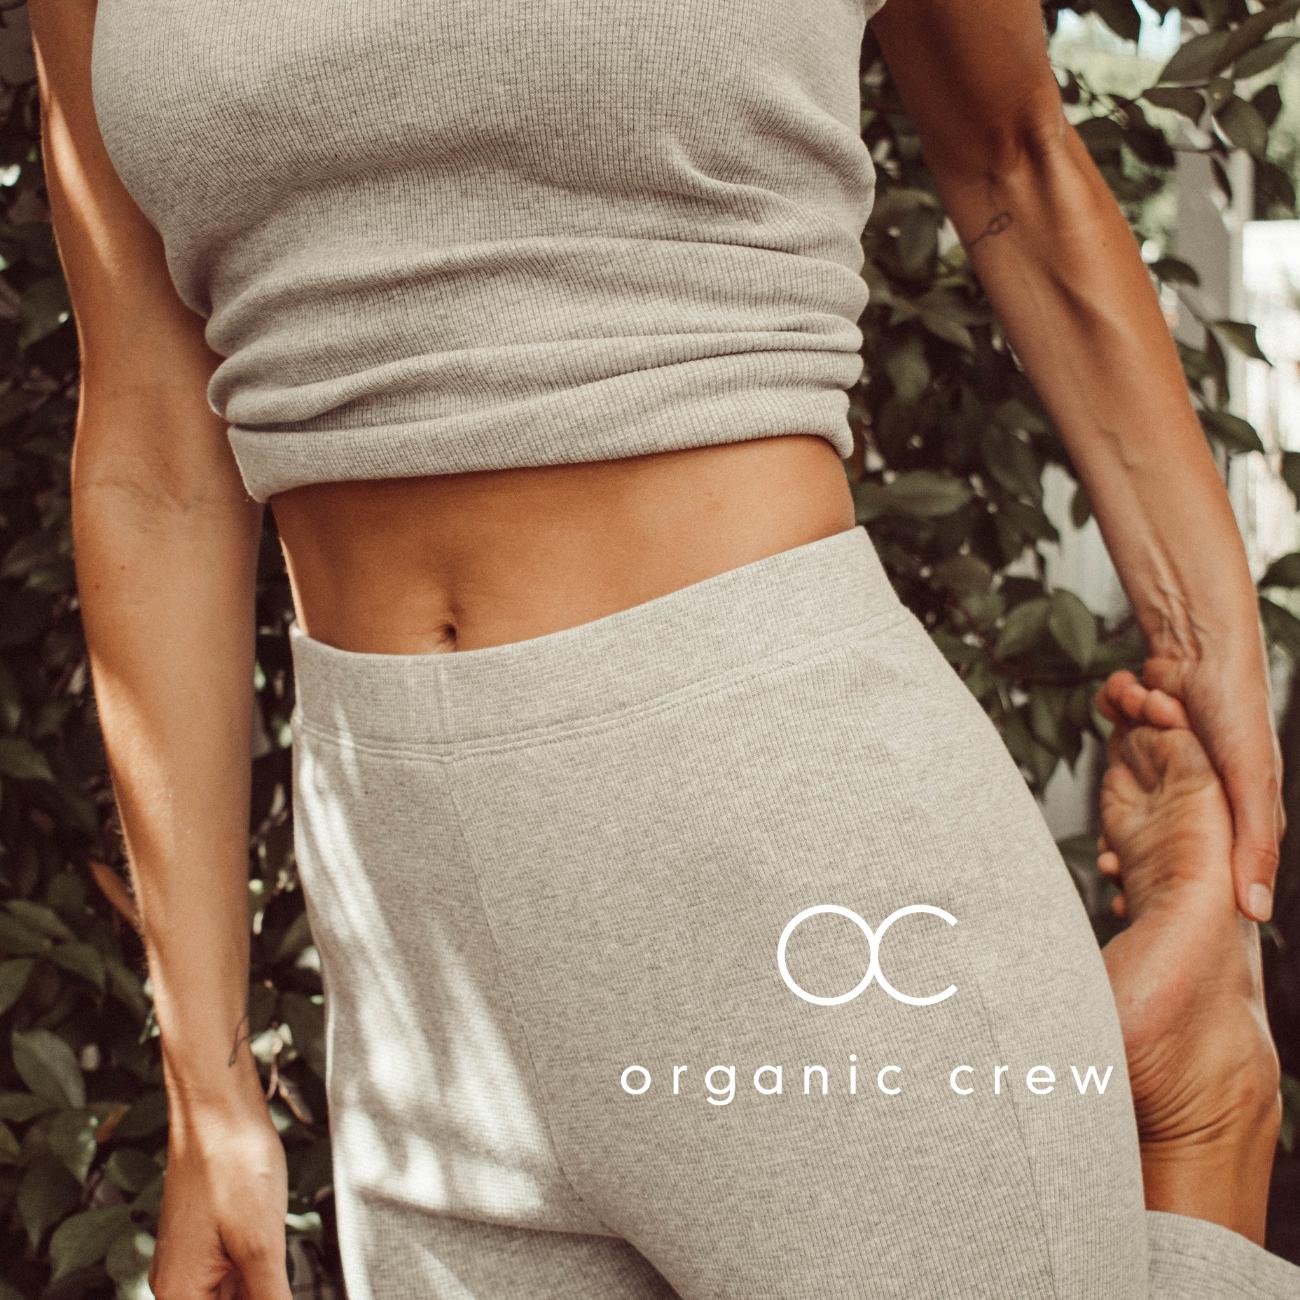 Organic Crew marketing case study